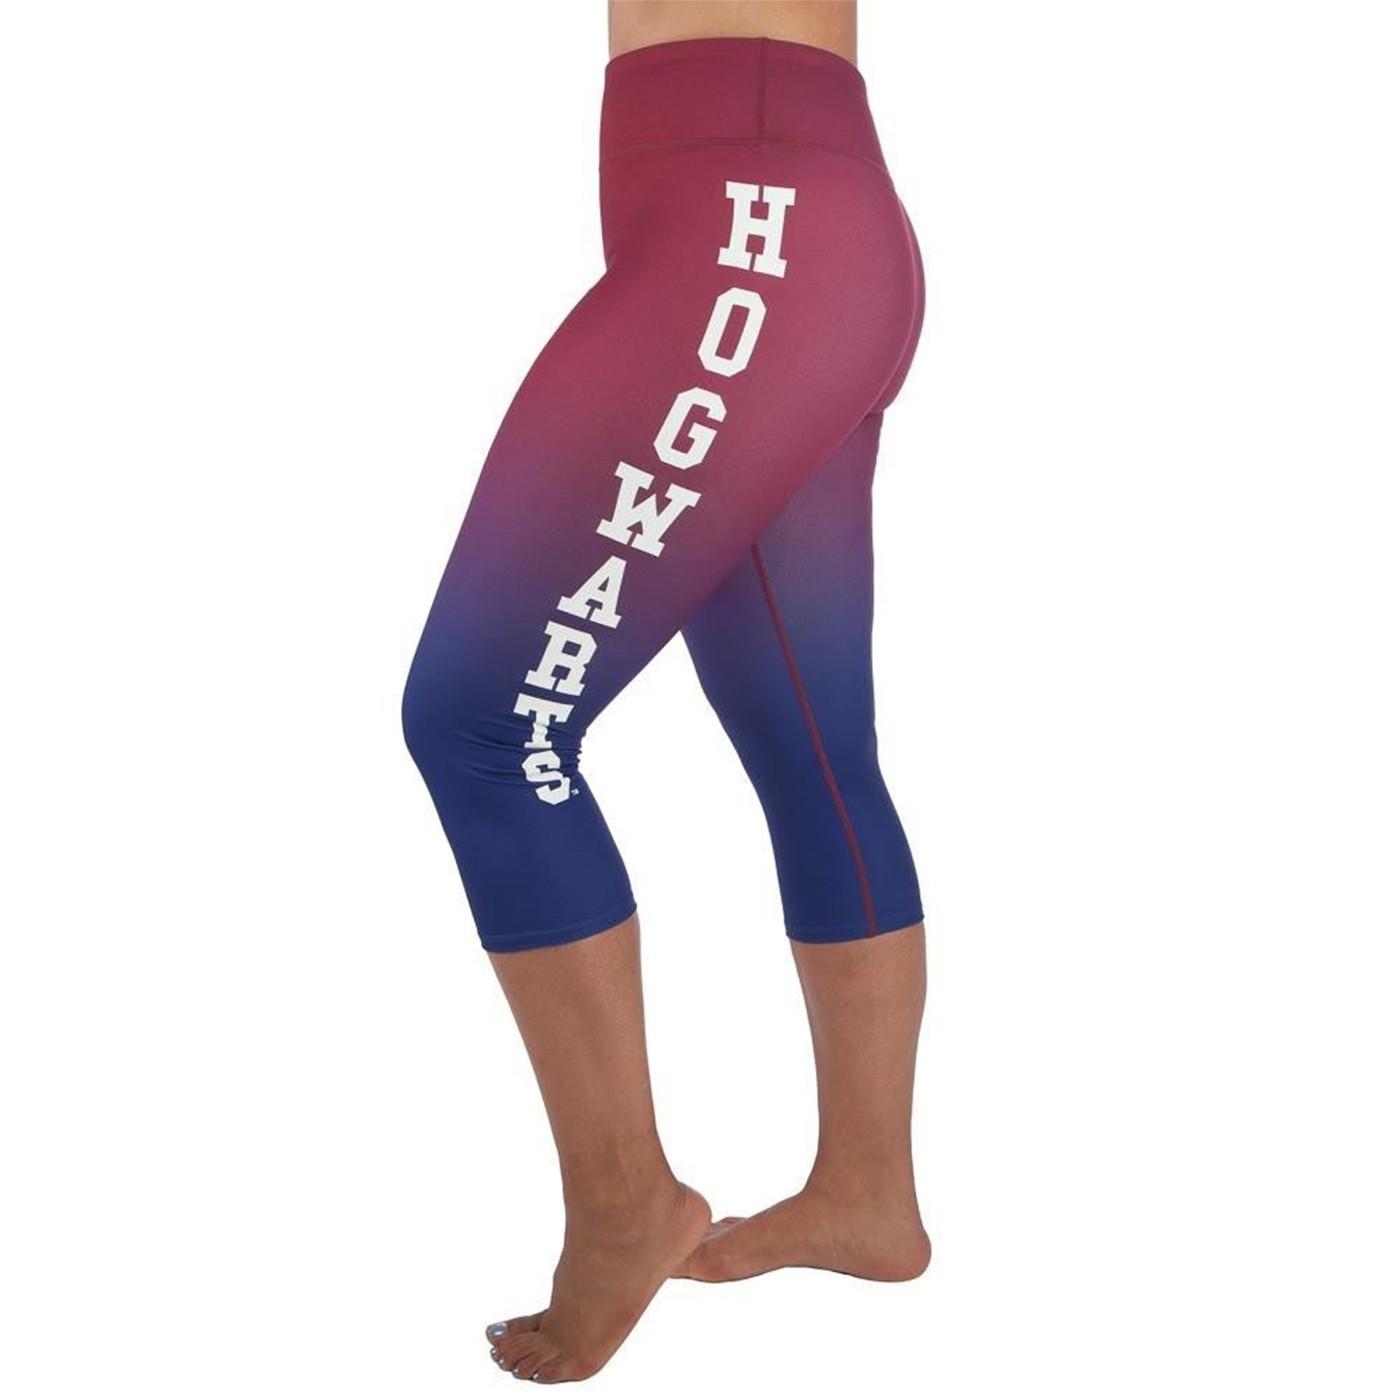 Harry Potter Women's Athletic Crop Pants